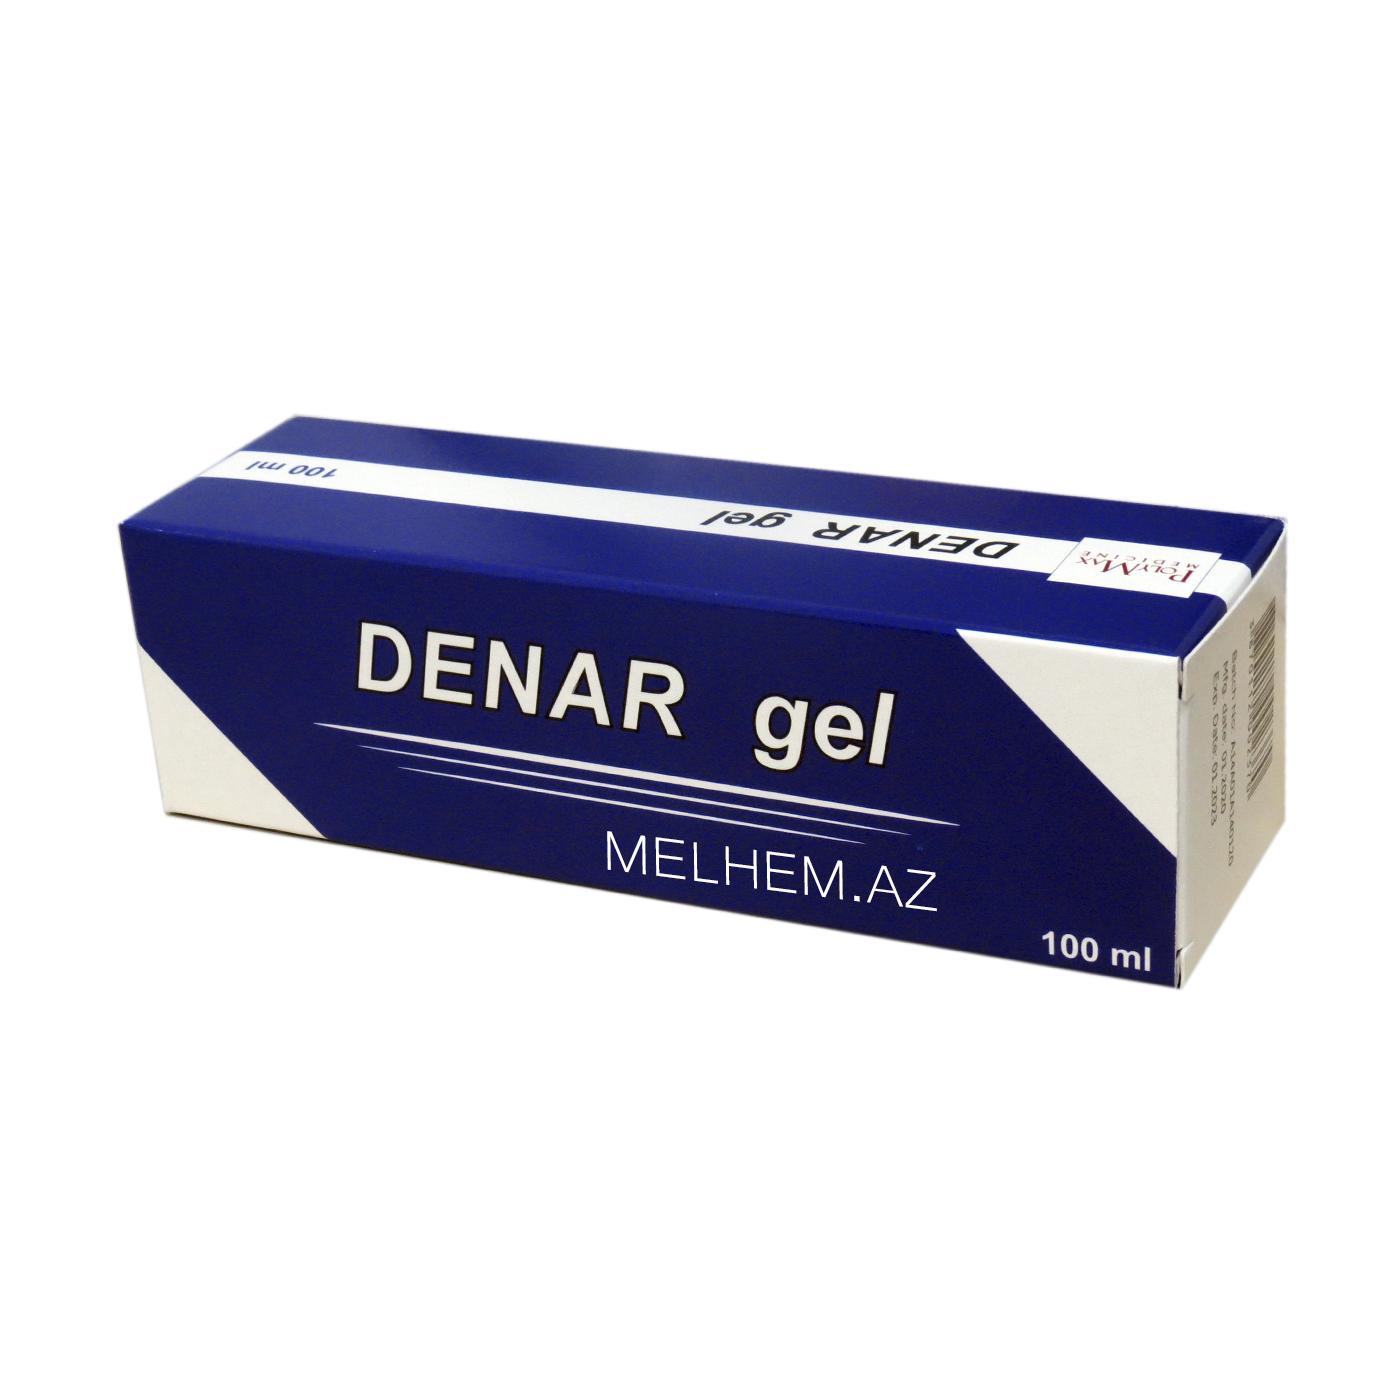 DENAR GEL 100 ML